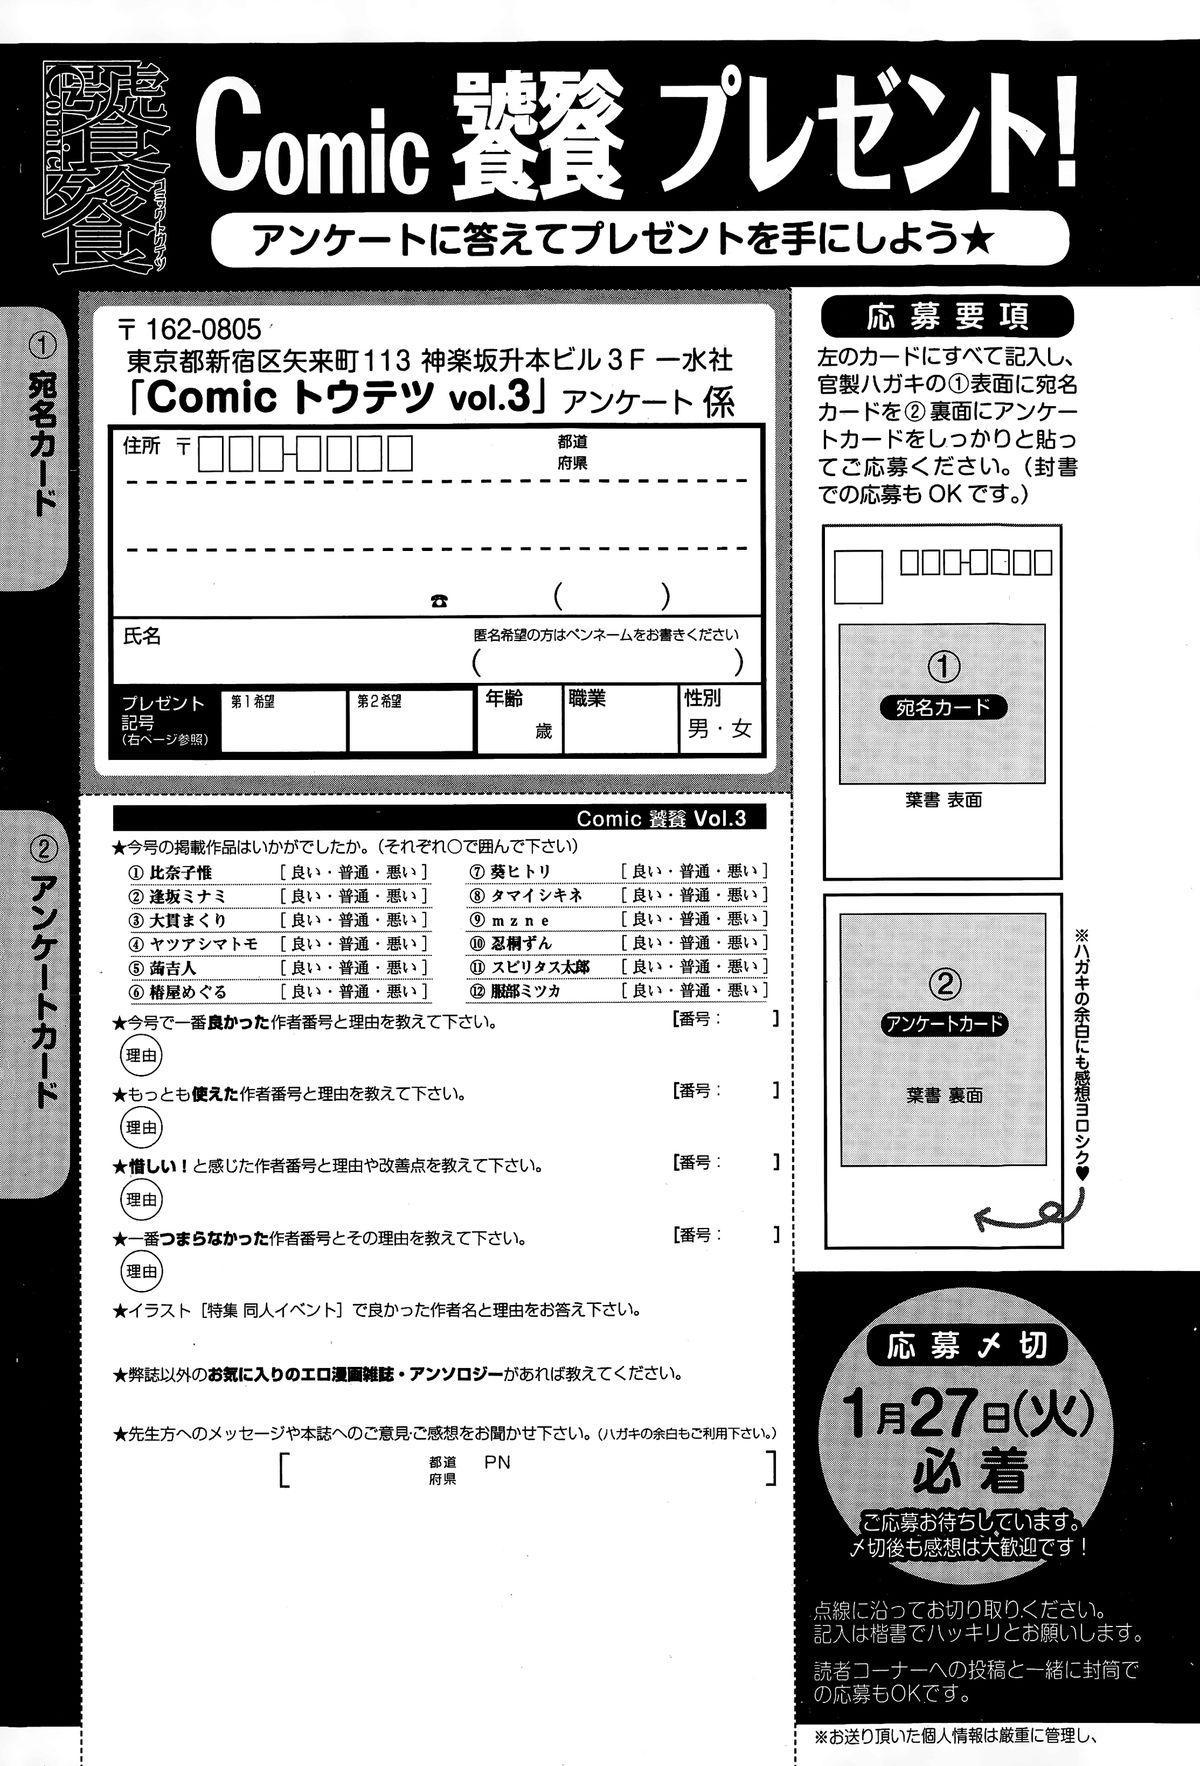 Comic Toutetsu 2015-02 Vol. 3 236